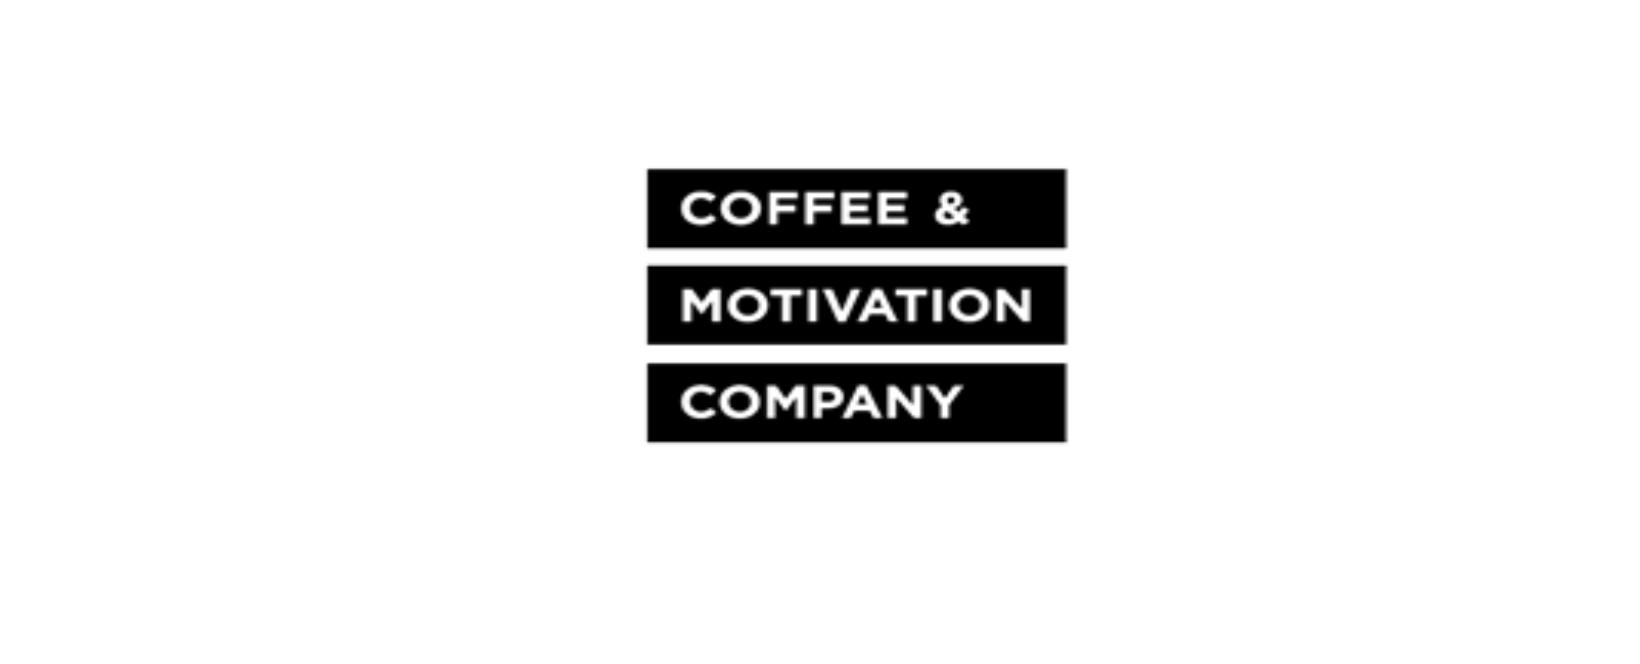 Coffee & Motivation Discount Code 2021